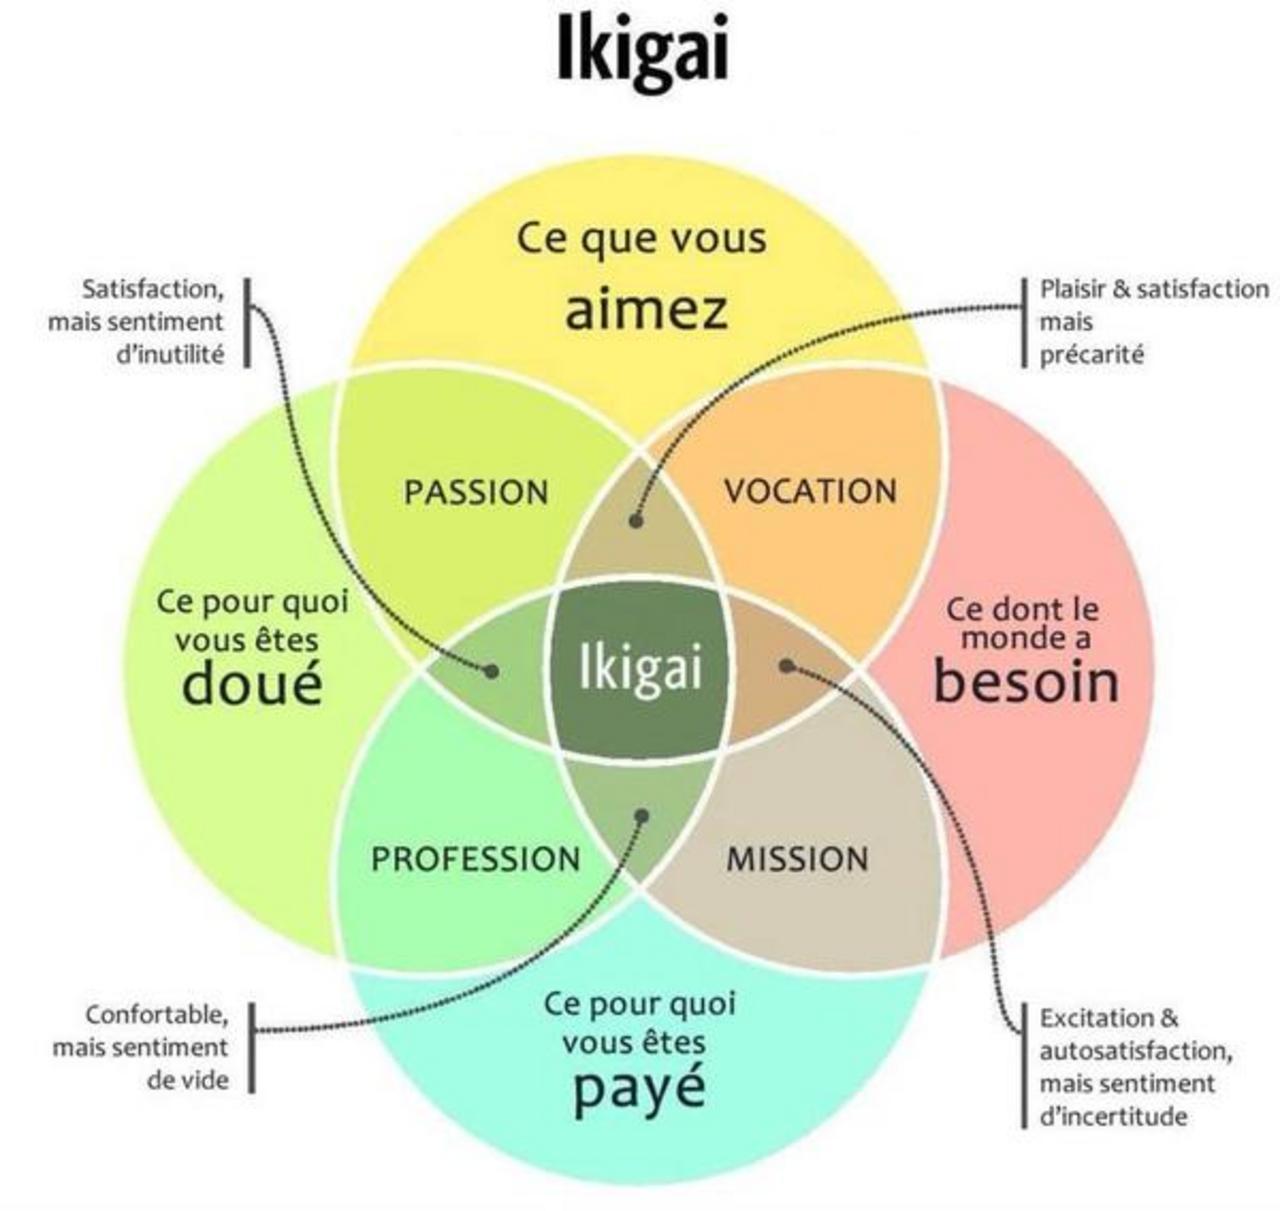 ikigai-schema-739538-0@1x.jpg